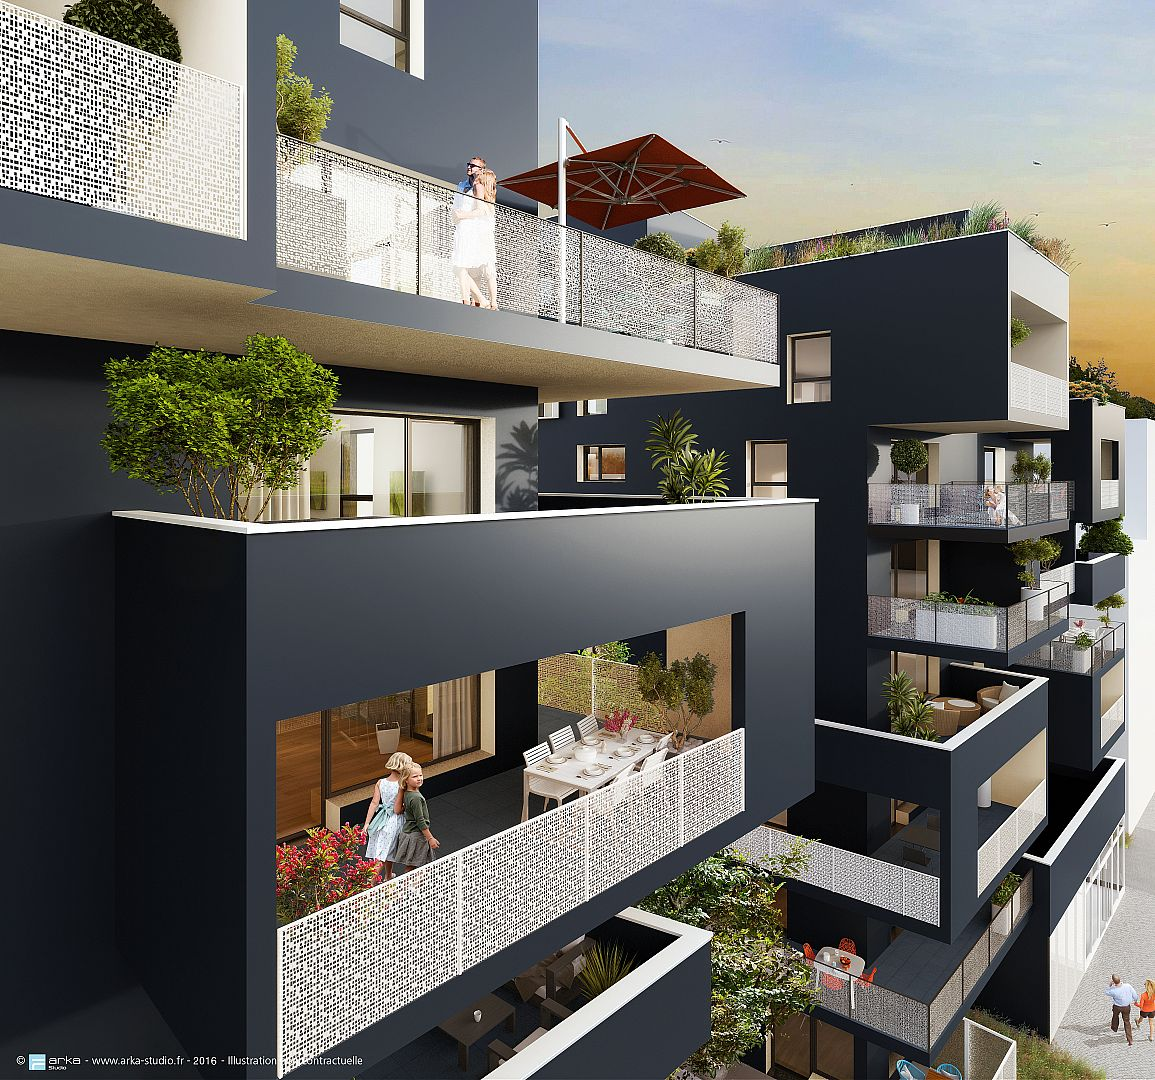 Achat appartement neuf rennes programme neuf enjoy for Achat appartement programme neuf